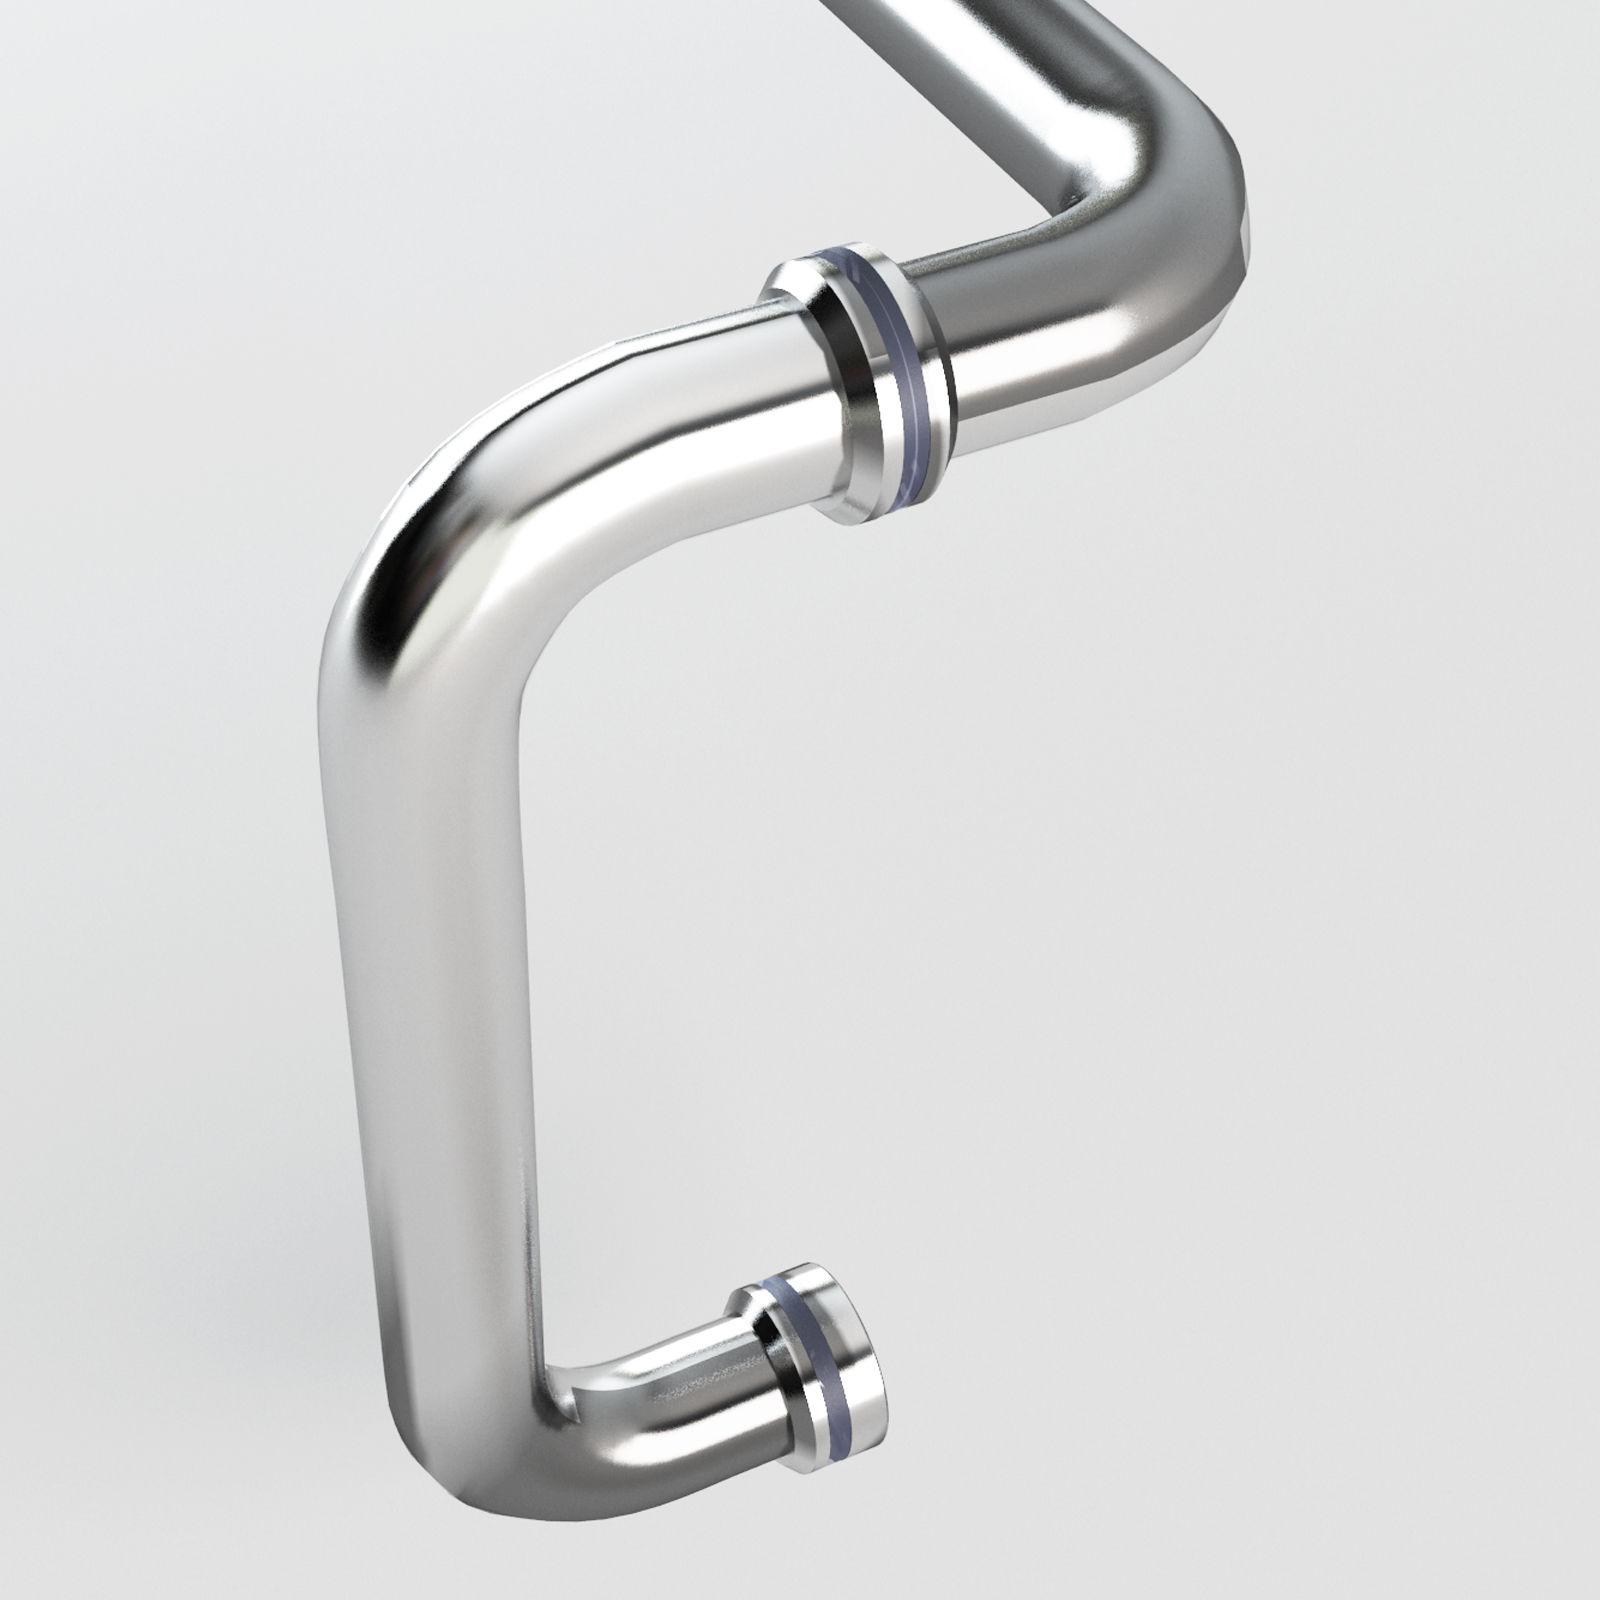 Sunny Shower 6 Quot Pull Handle 18 Quot Towel Bar Combination